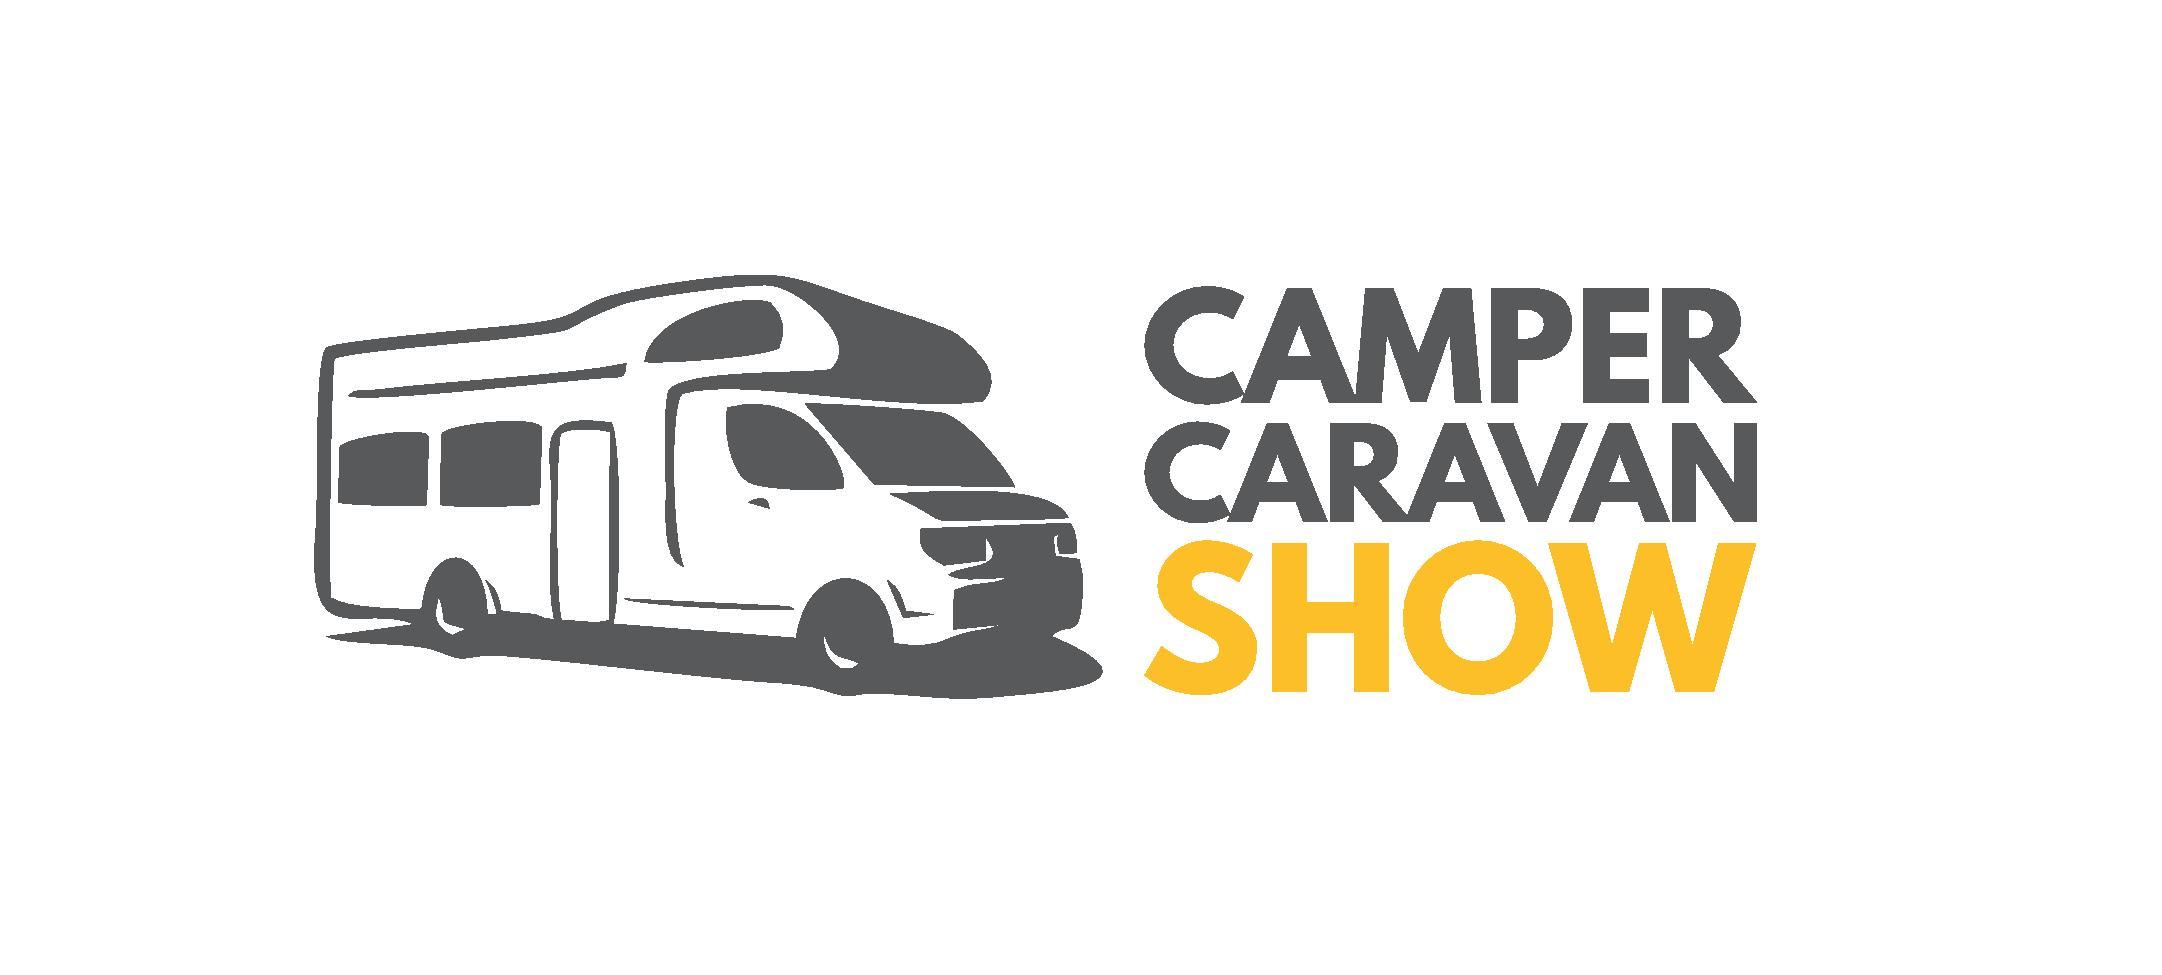 Camper & Caravan Show 2019 - Największe targi caravaningowe w Polsce!